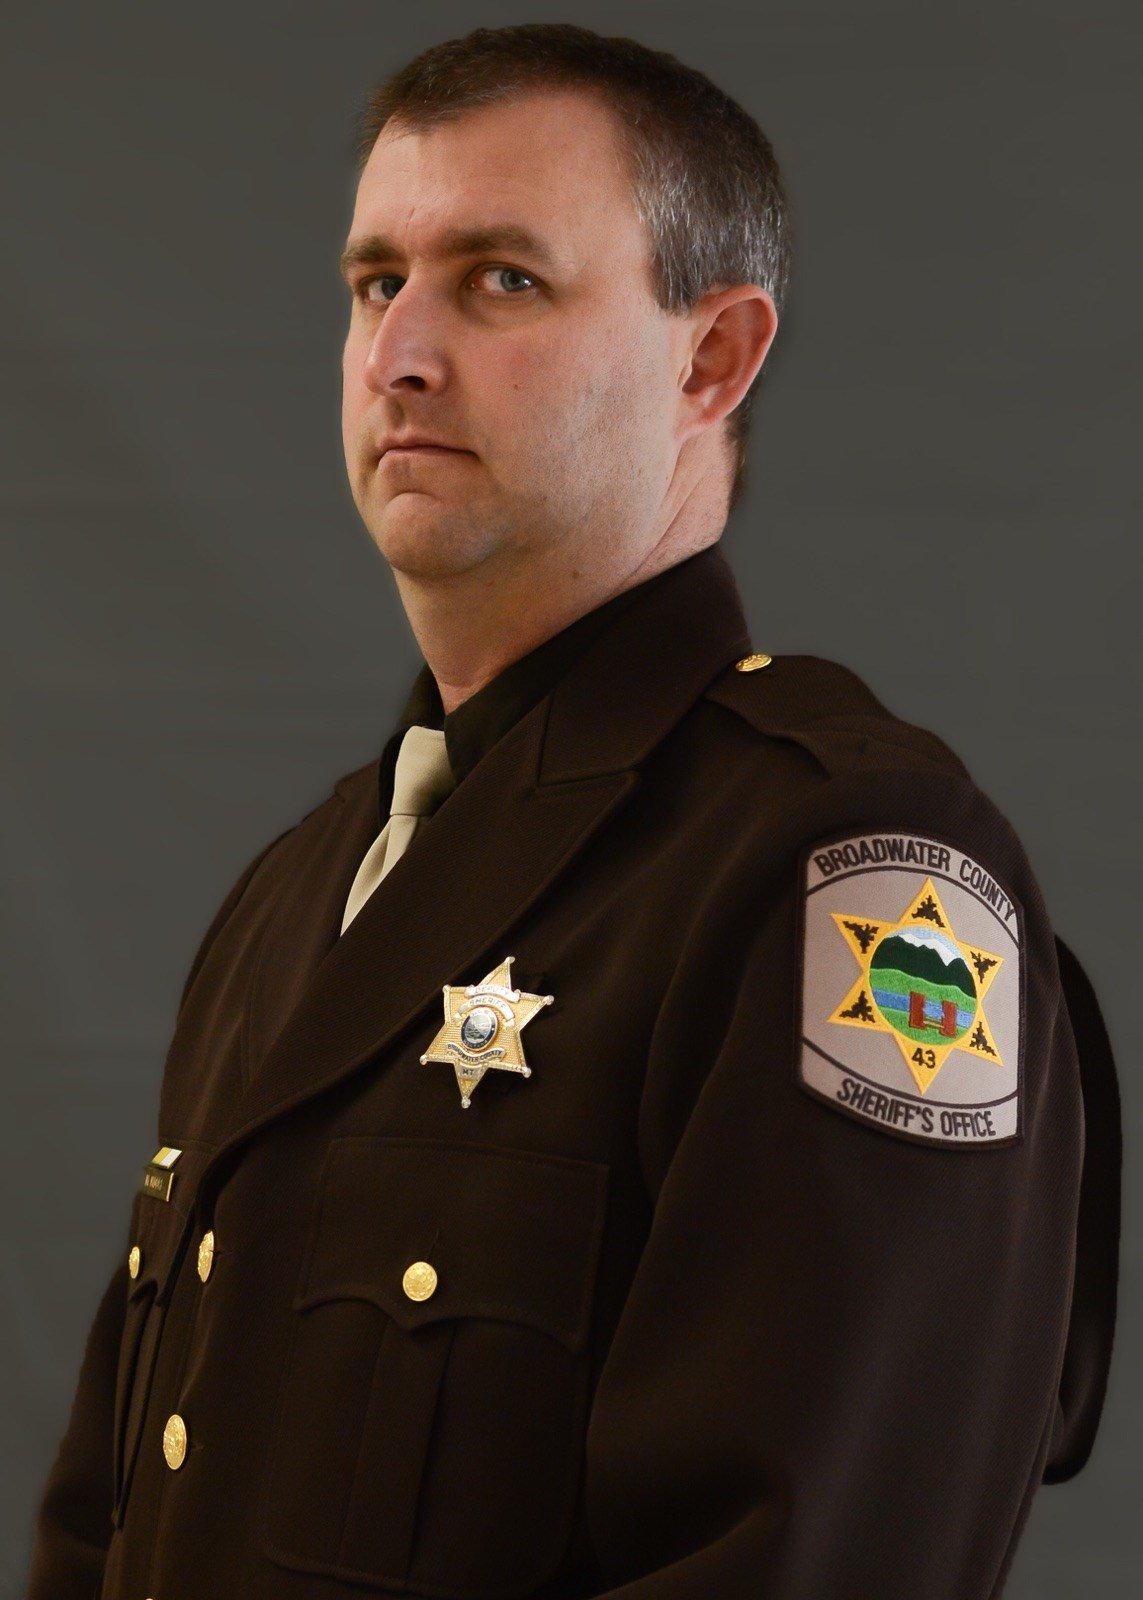 Deputy Mason Moore was a father of three children.